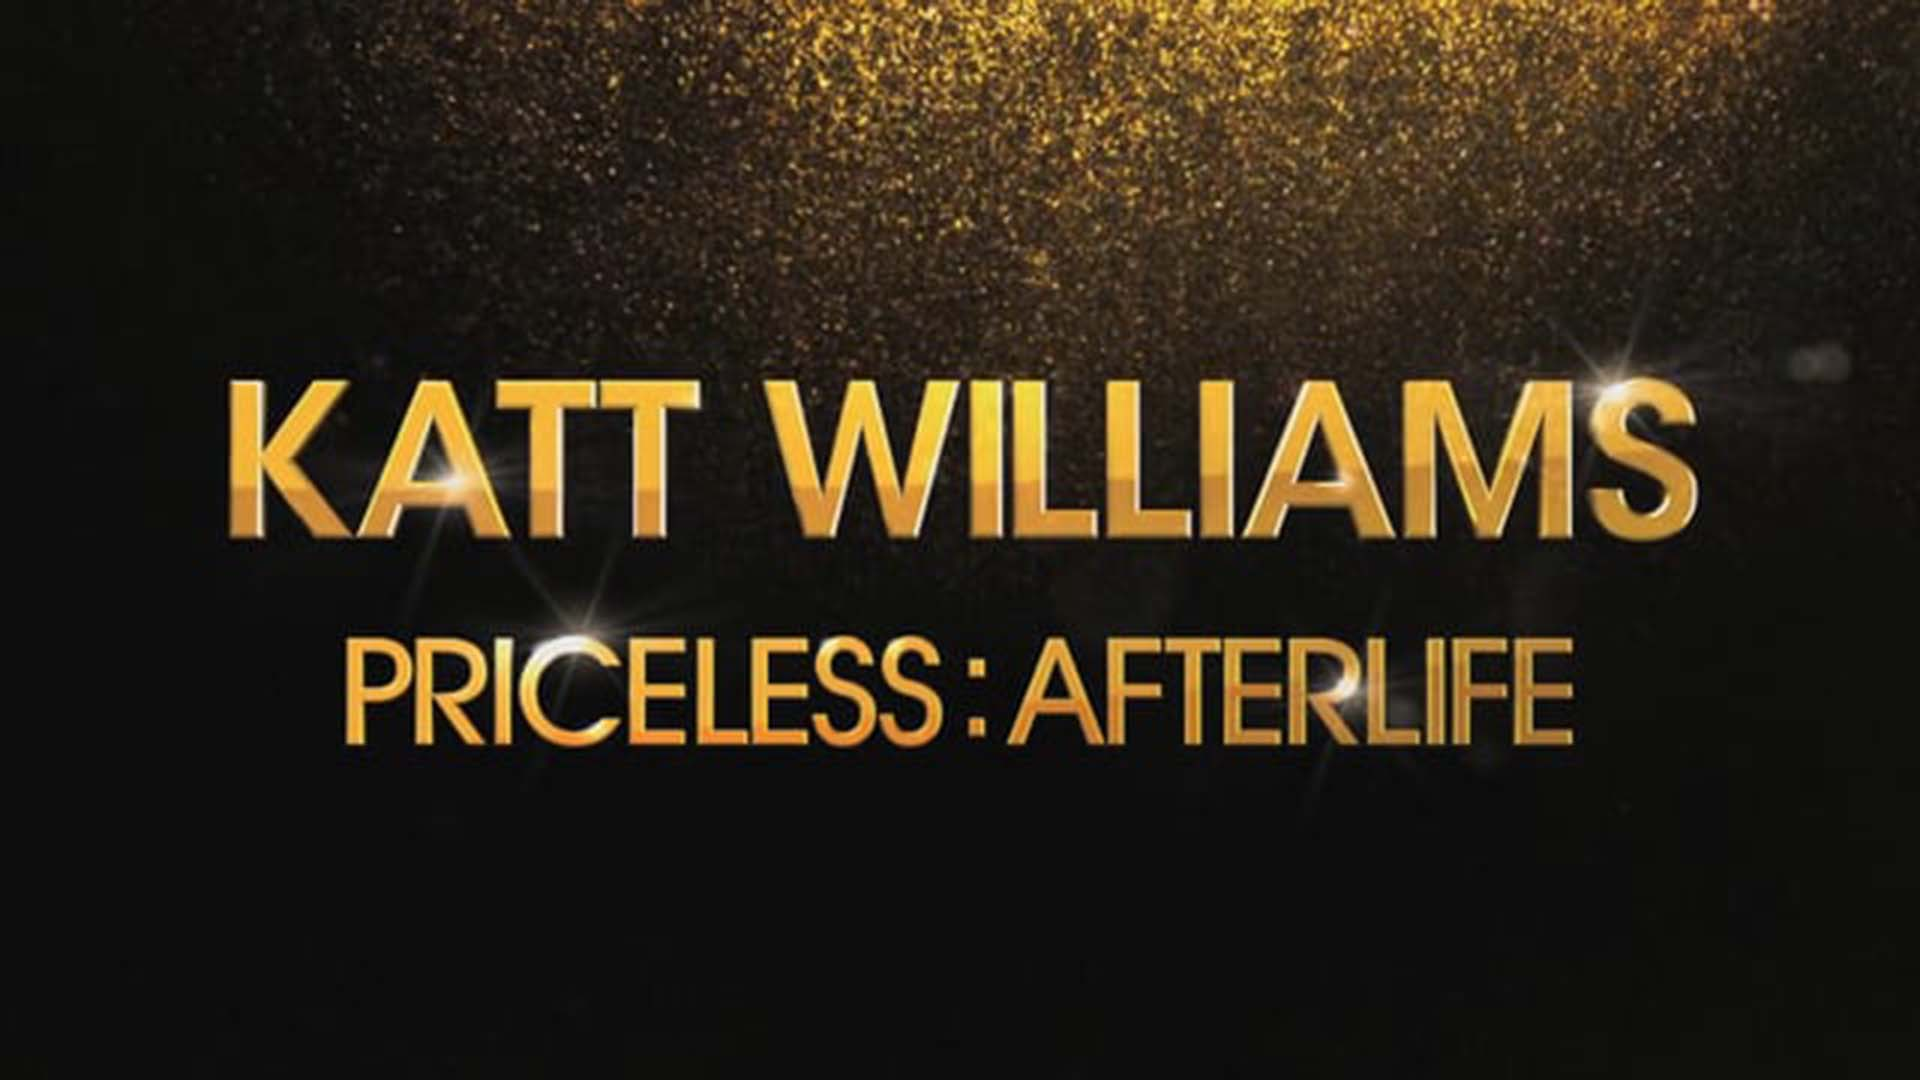 Katt Williams Priceless Afterlife Horizontal